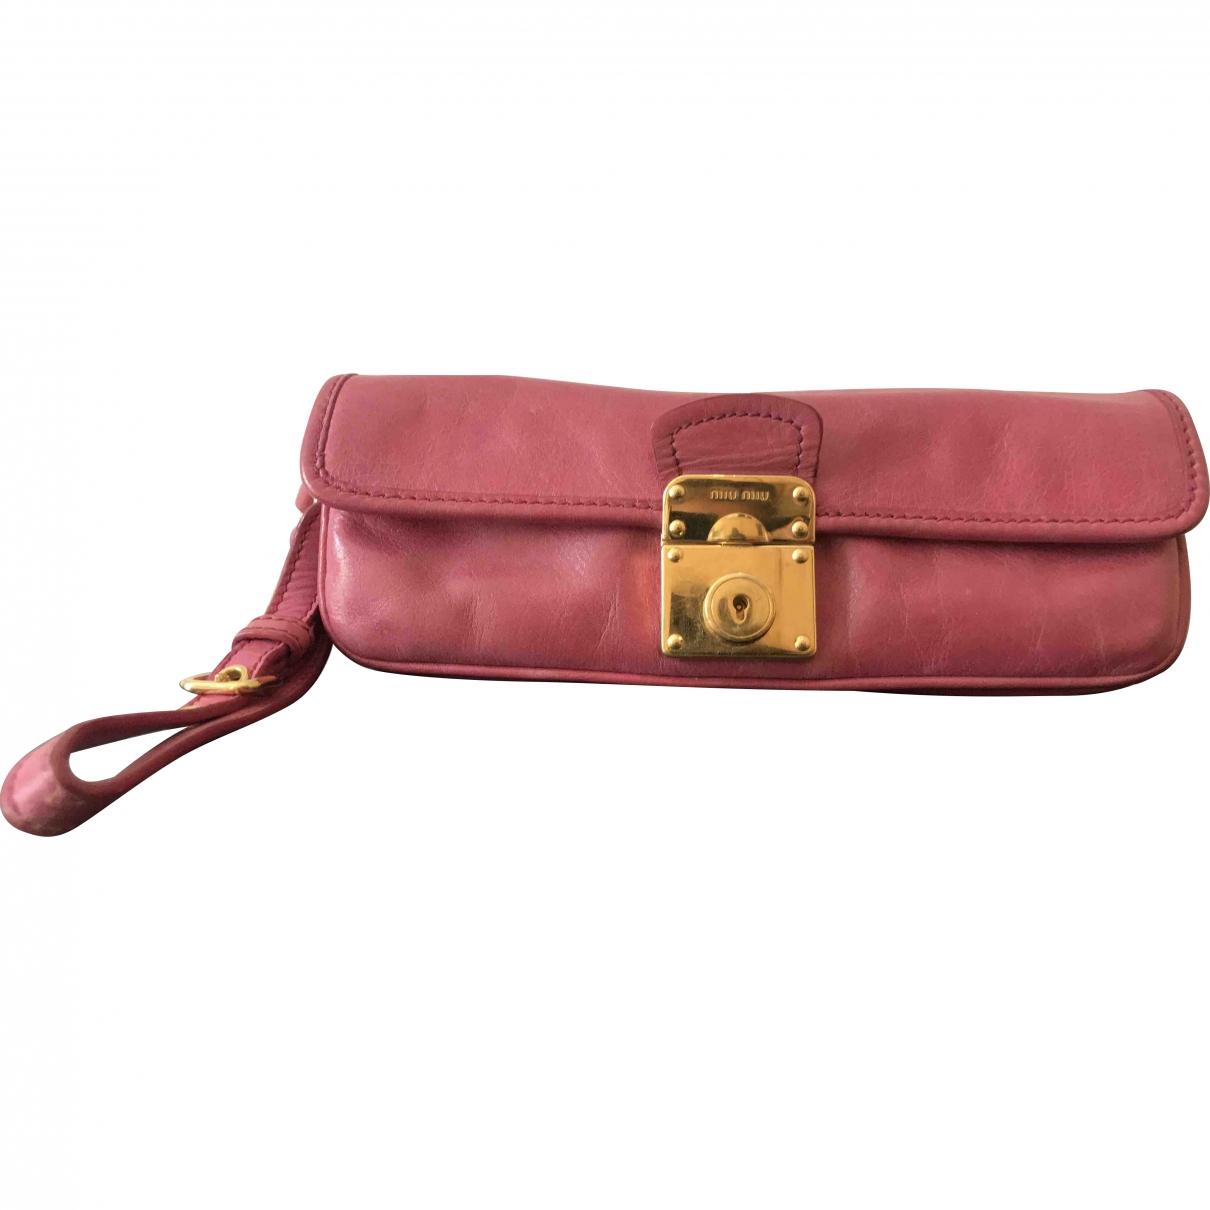 Miu Miu \N Pink Leather Clutch bag for Women \N